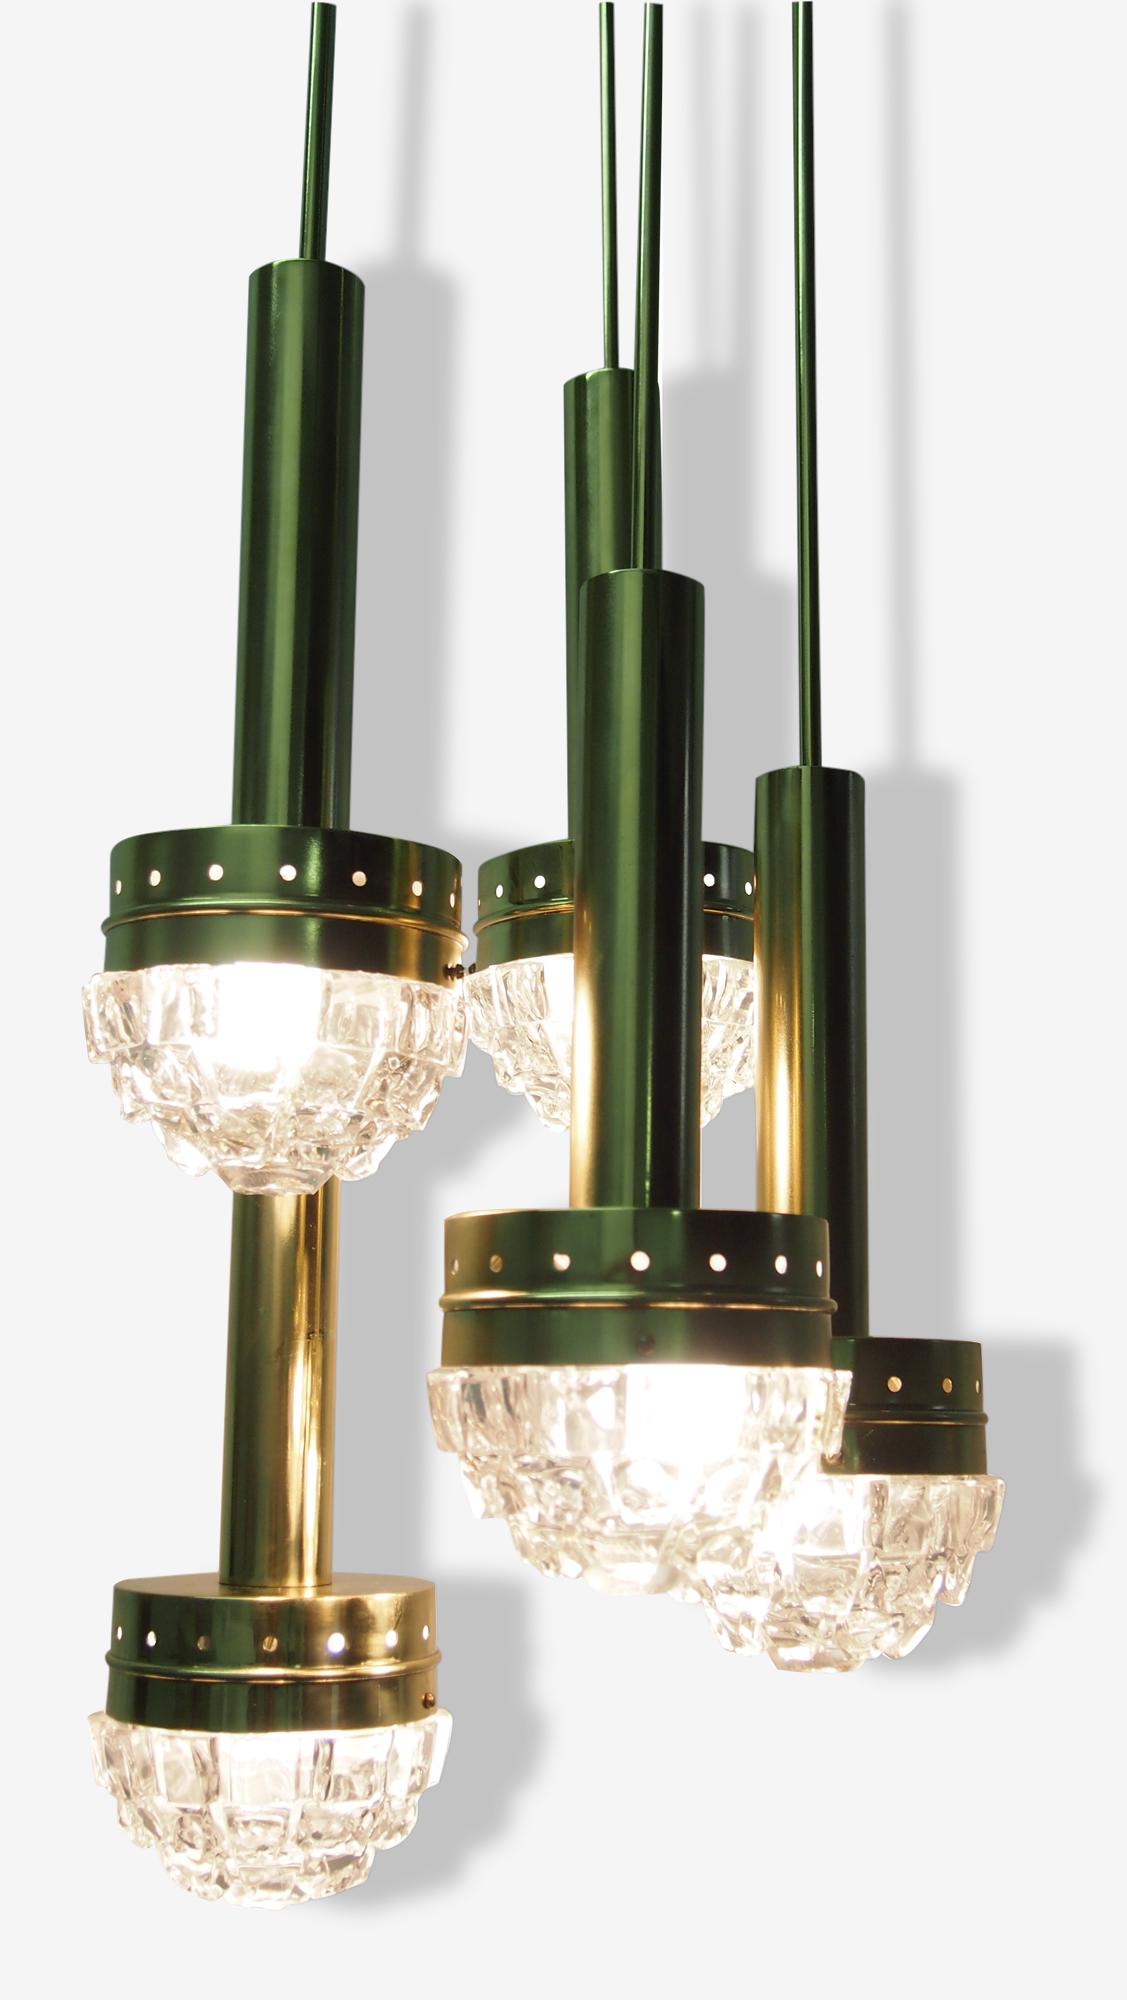 Suspension Lustre FAGERLUND Sputnik Cascade Mid Century Kalmar Moderne Brutaliste Verre Taille Murano Chandelier Pendant Ceiling Light Brutalist Glass Swedish